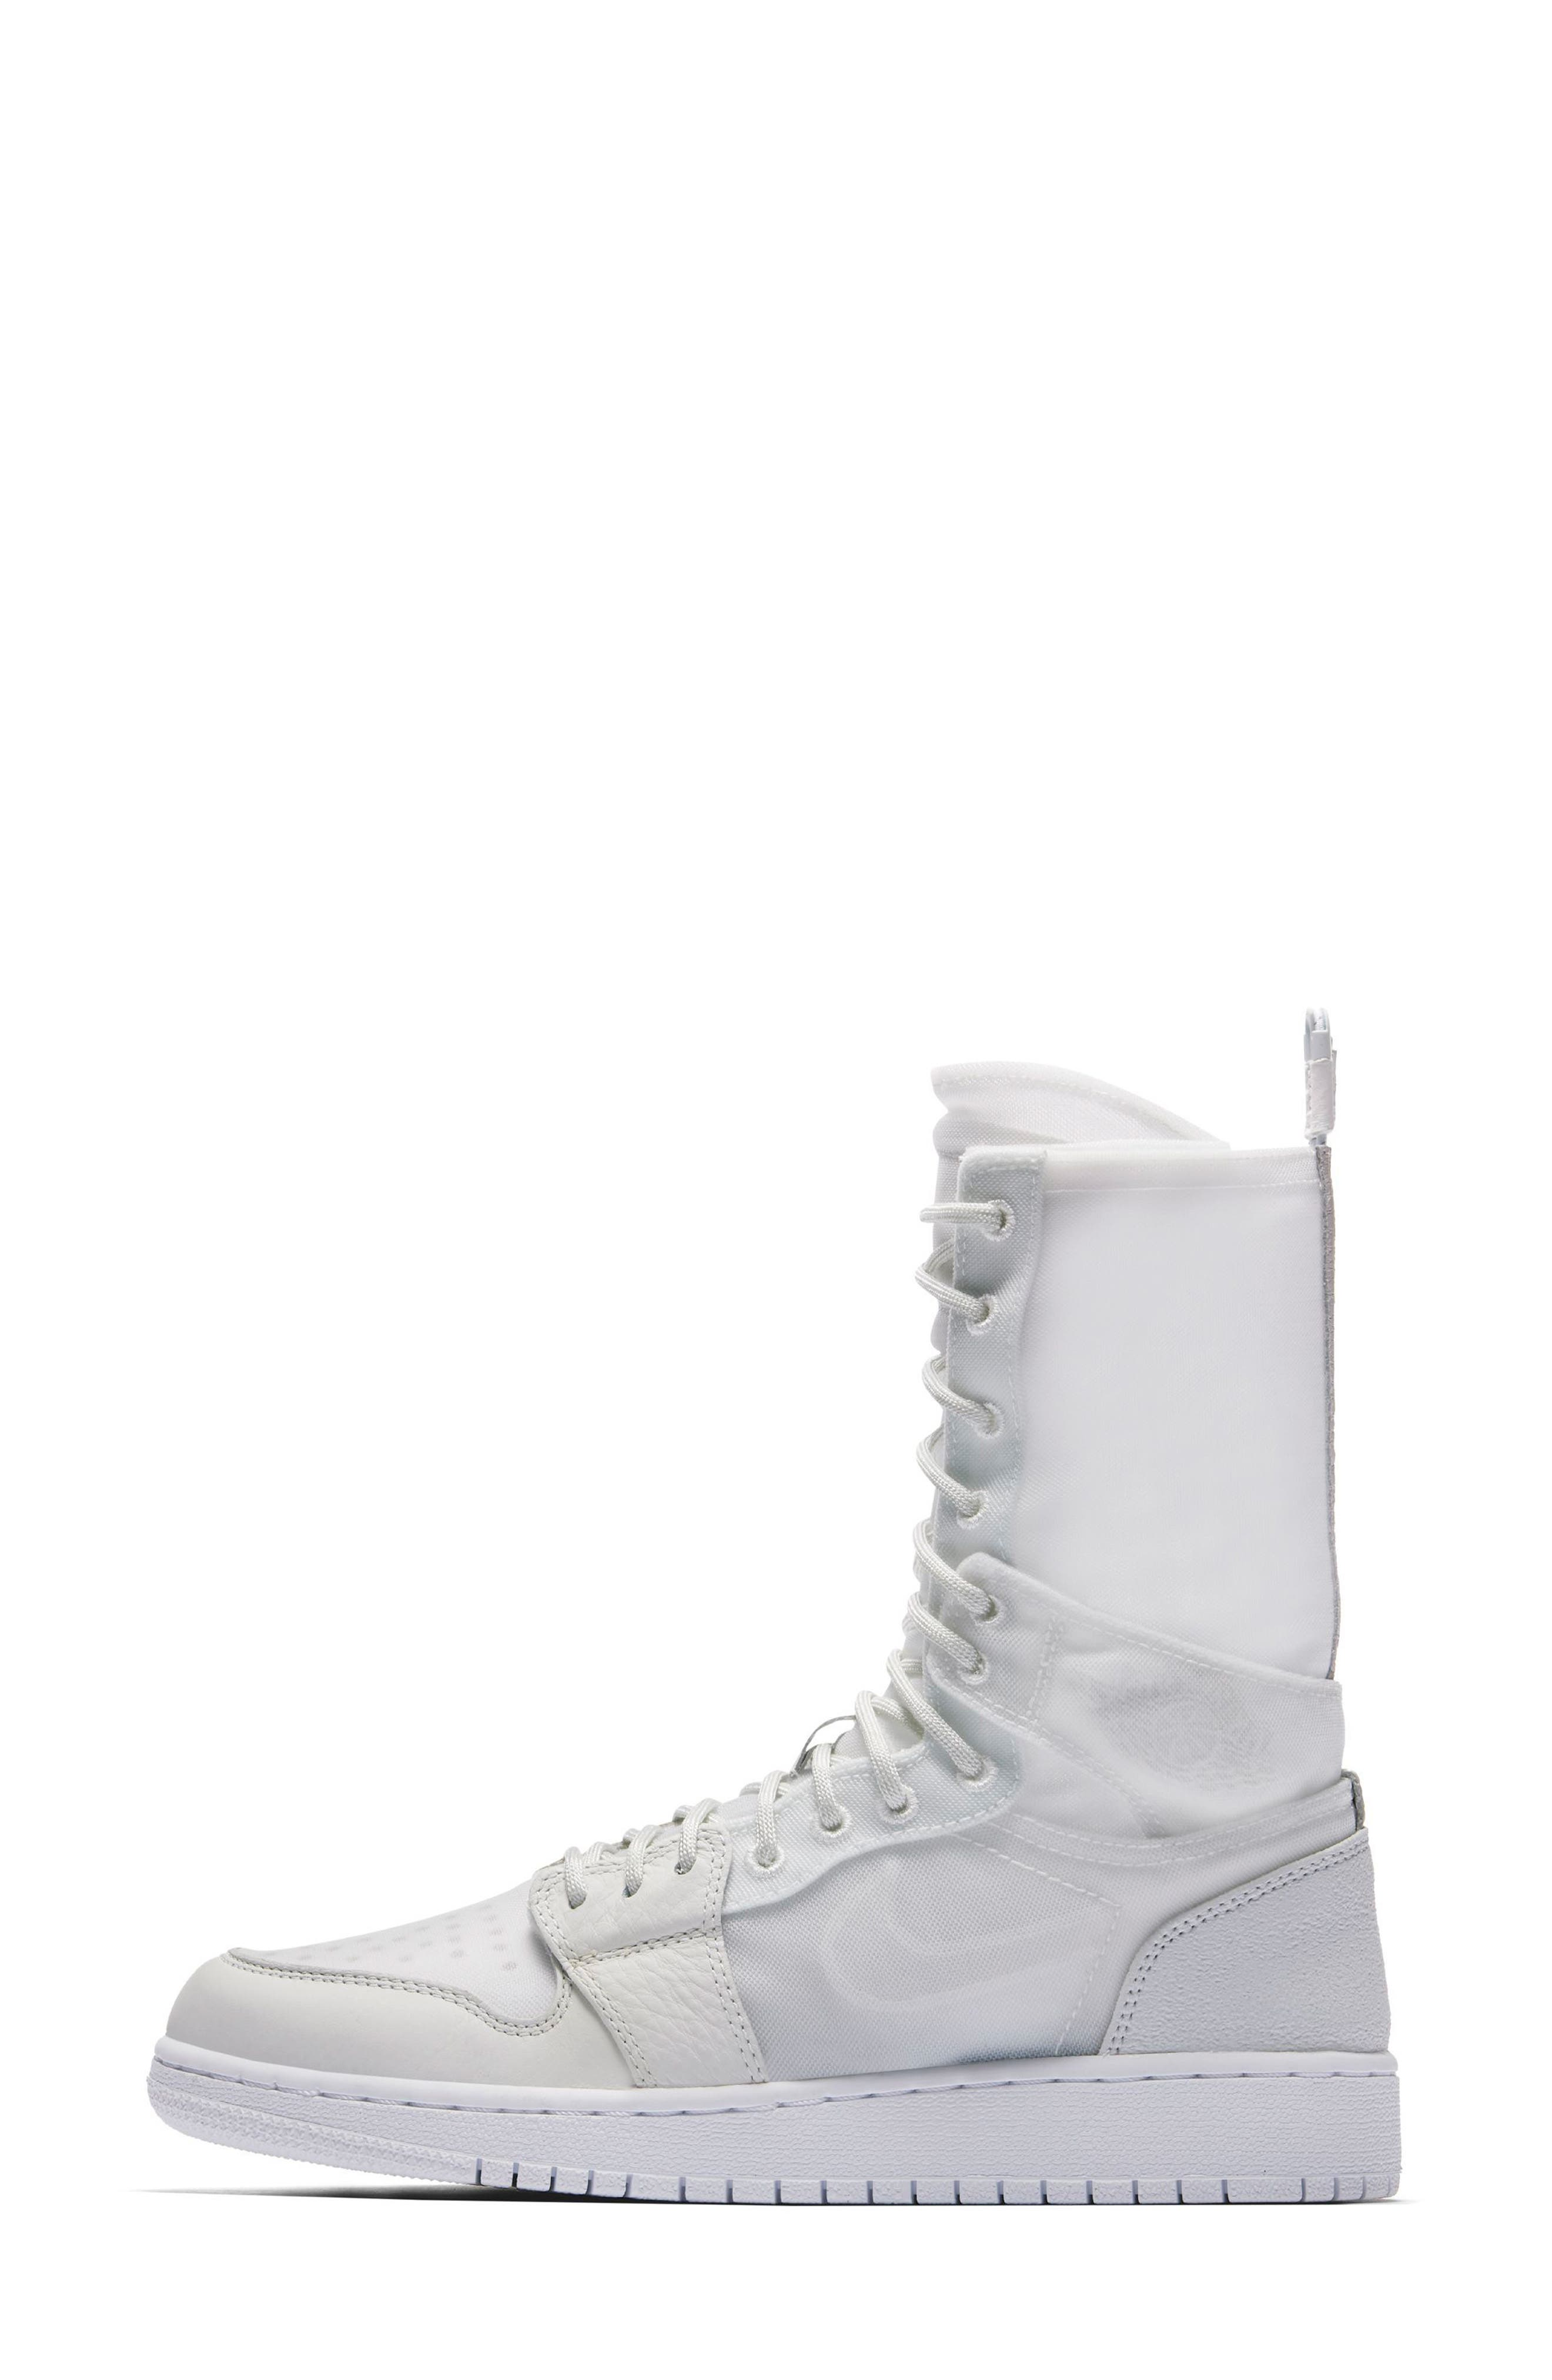 Air Jordan 1 Explorer XX Convertible High Top Sneaker,                             Alternate thumbnail 5, color,